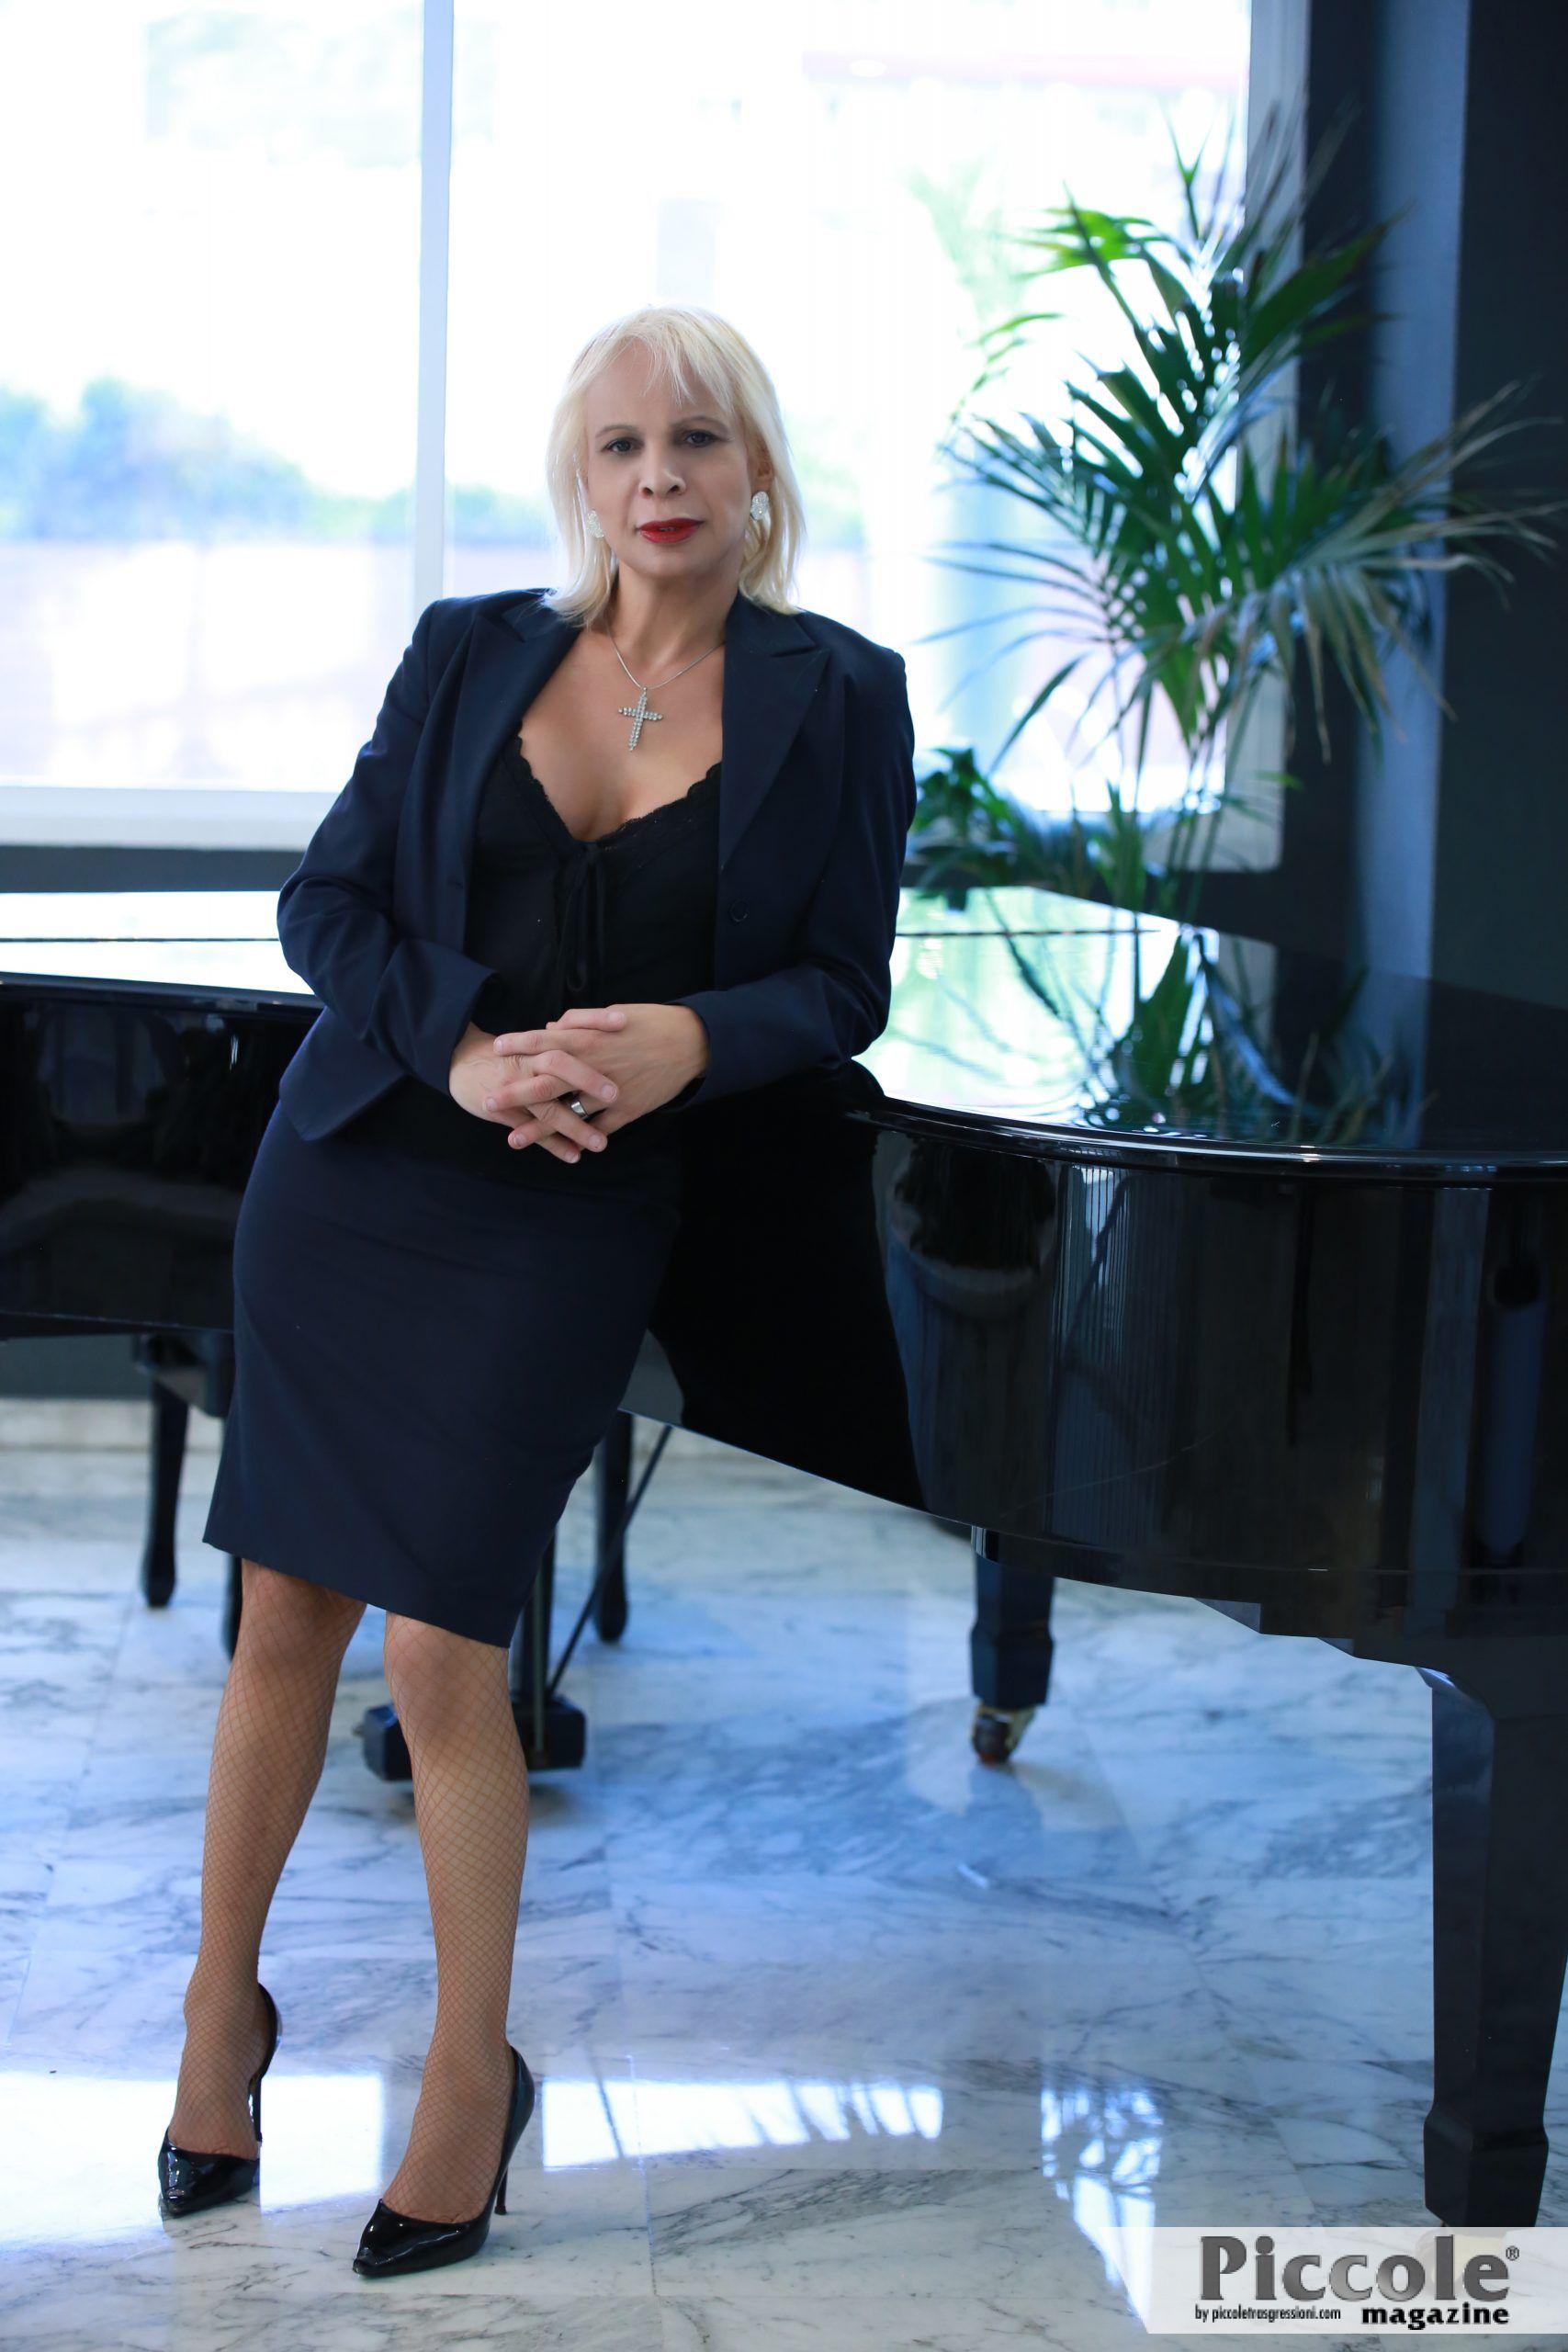 Regina Satariano